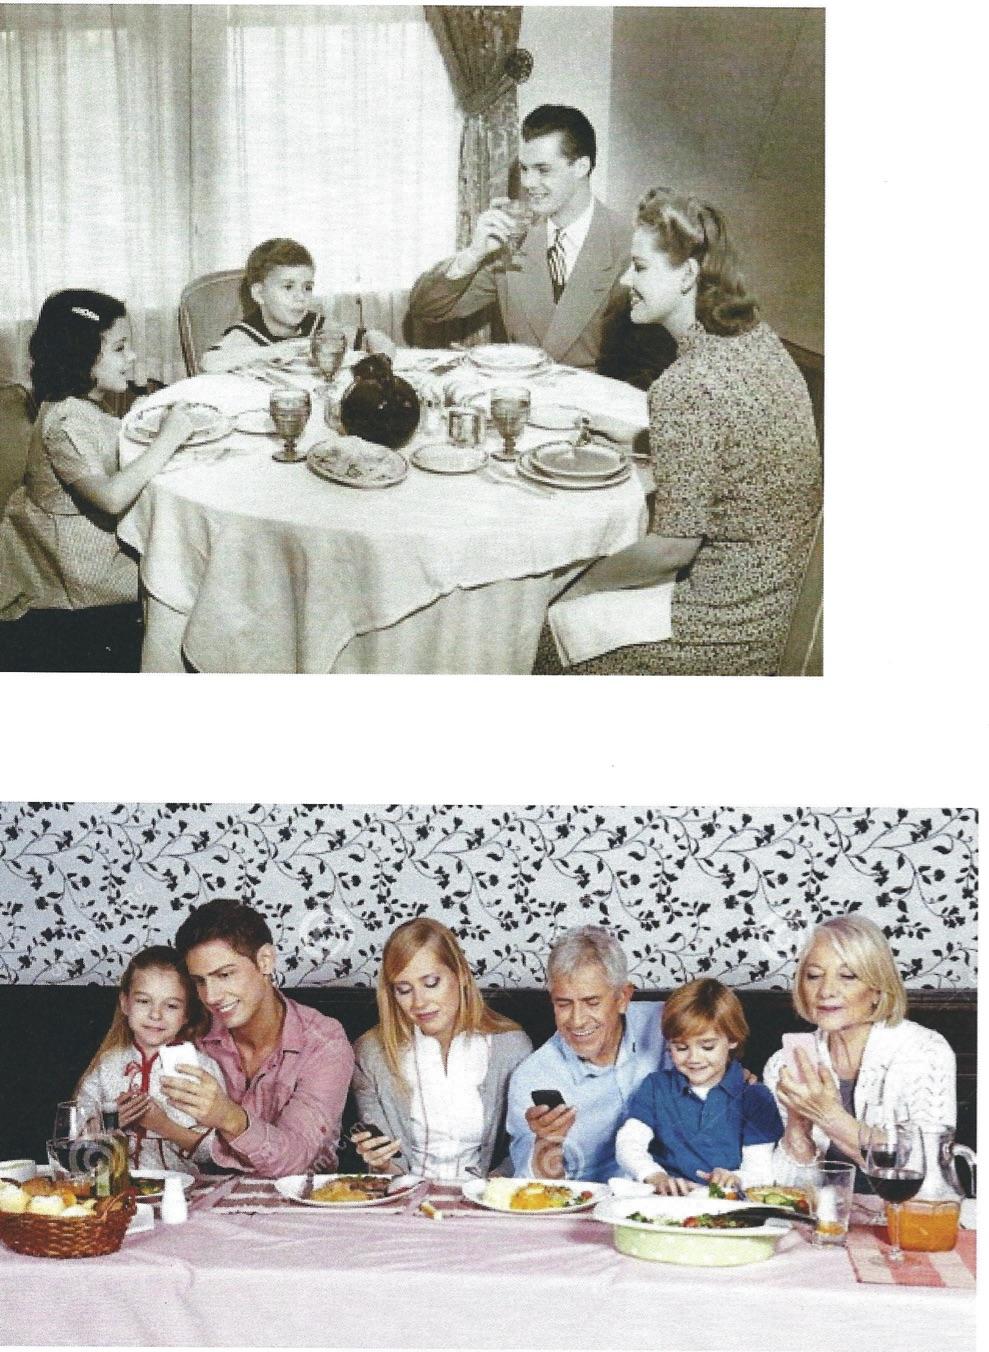 gentilezza a tavola